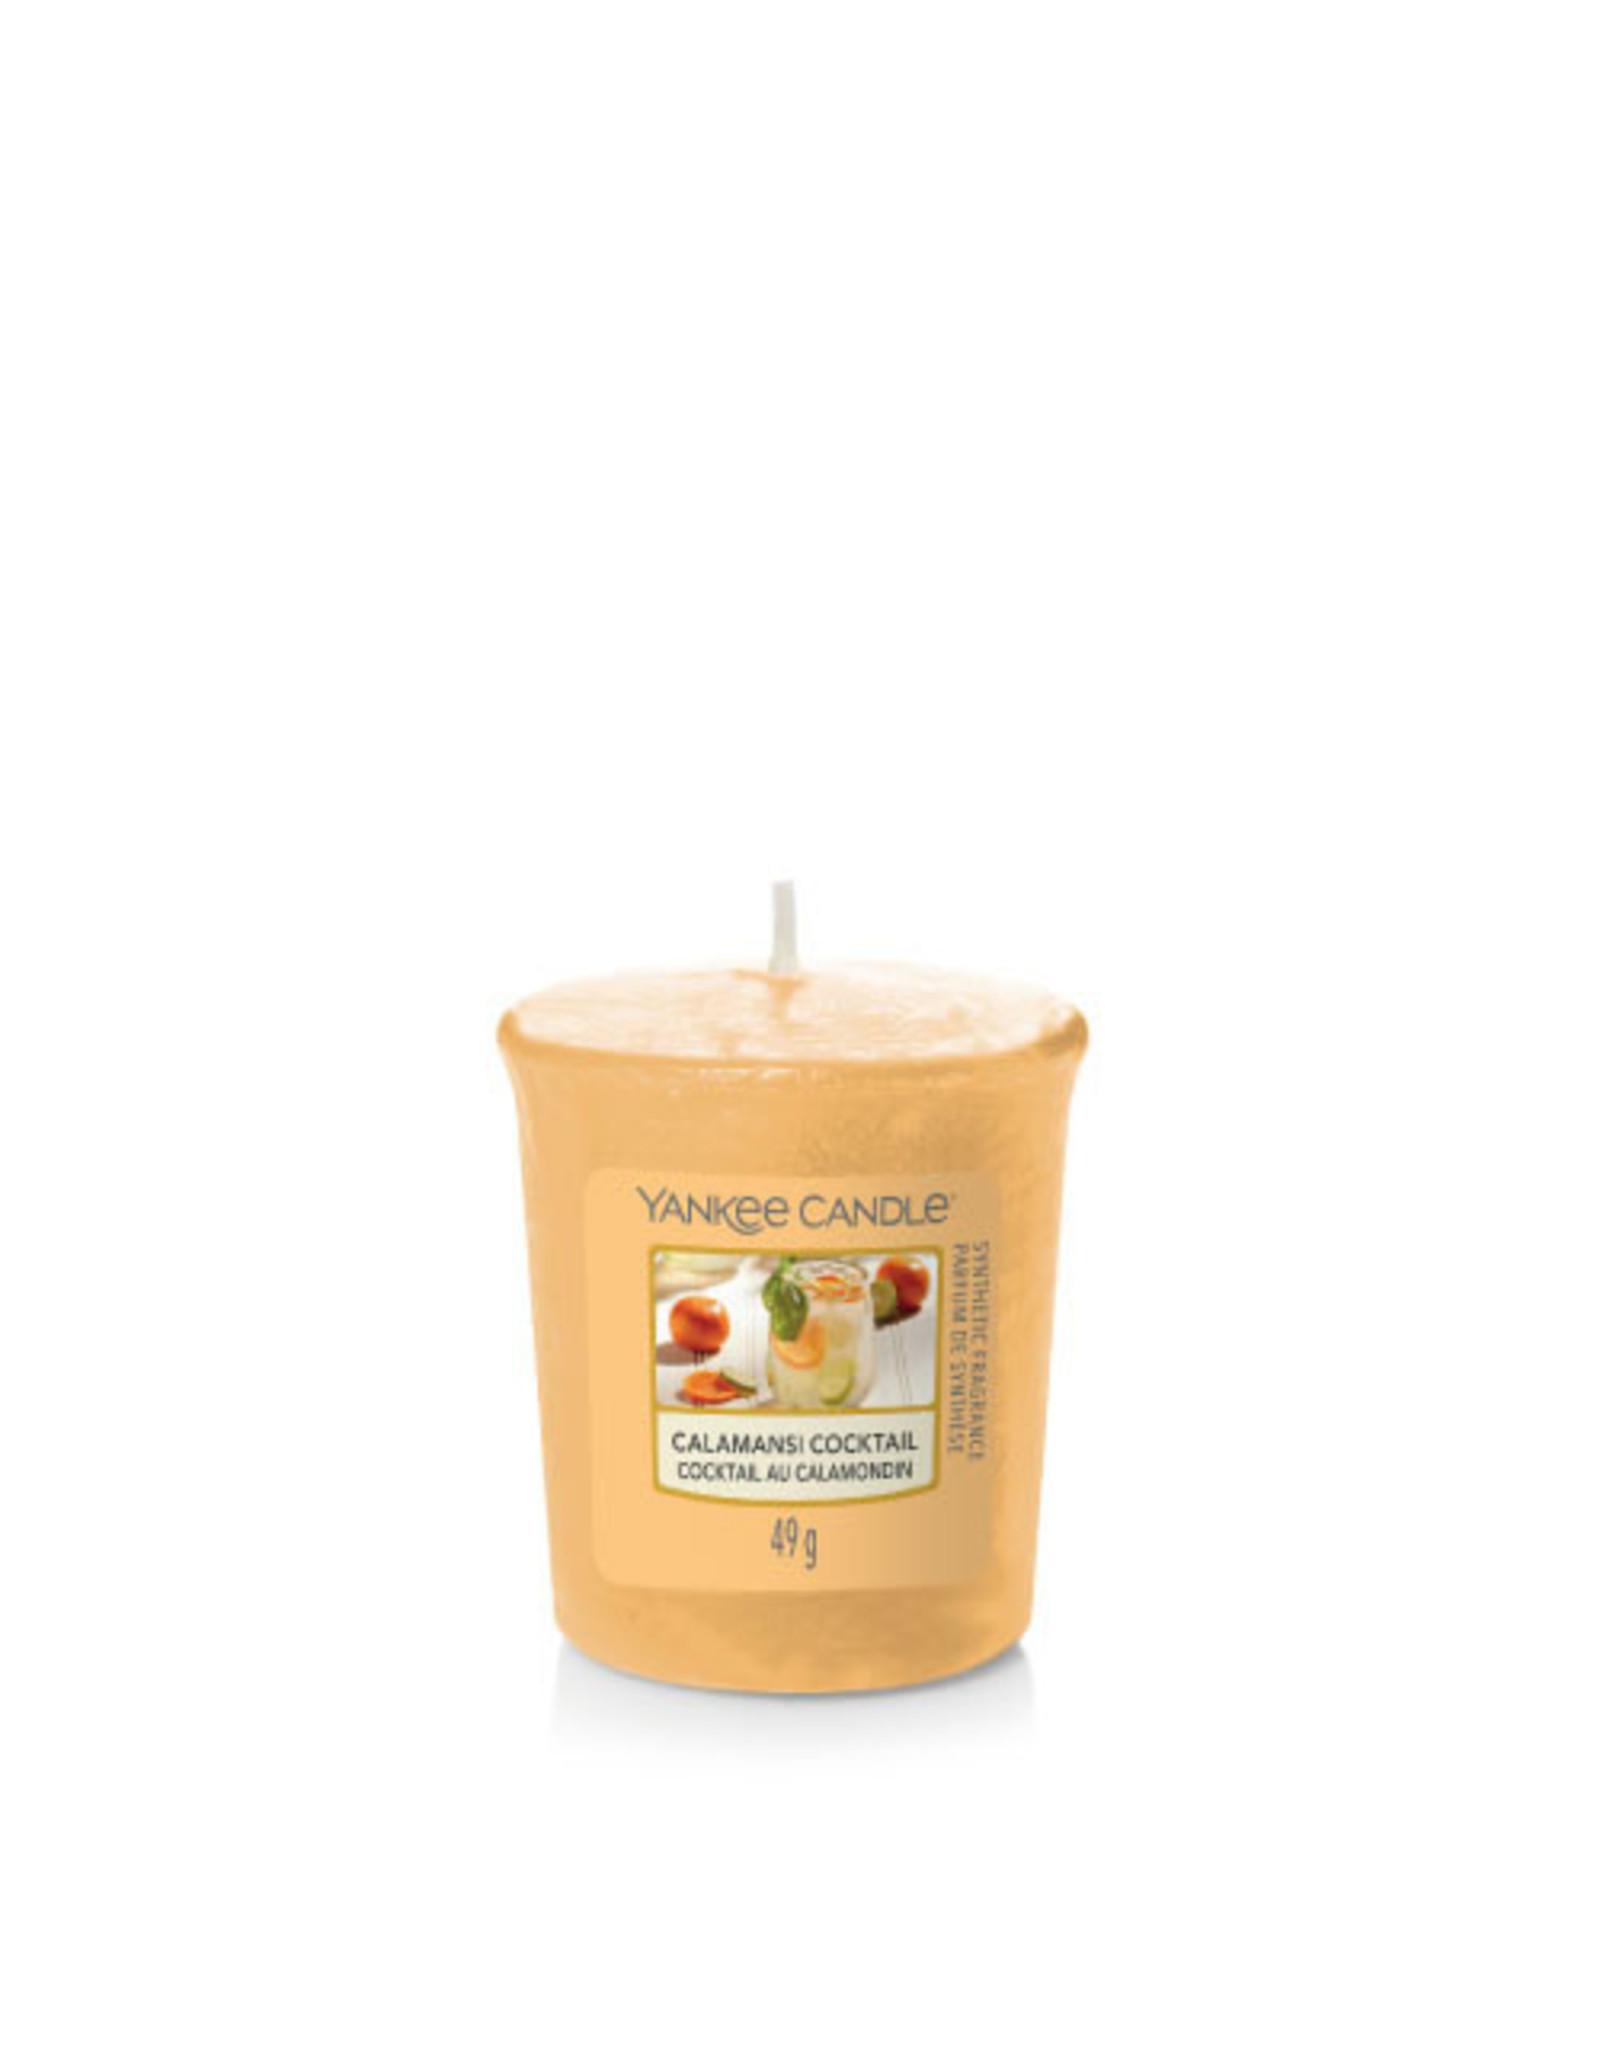 Yankee Candle Calamansi Cocktail Yankee Candle